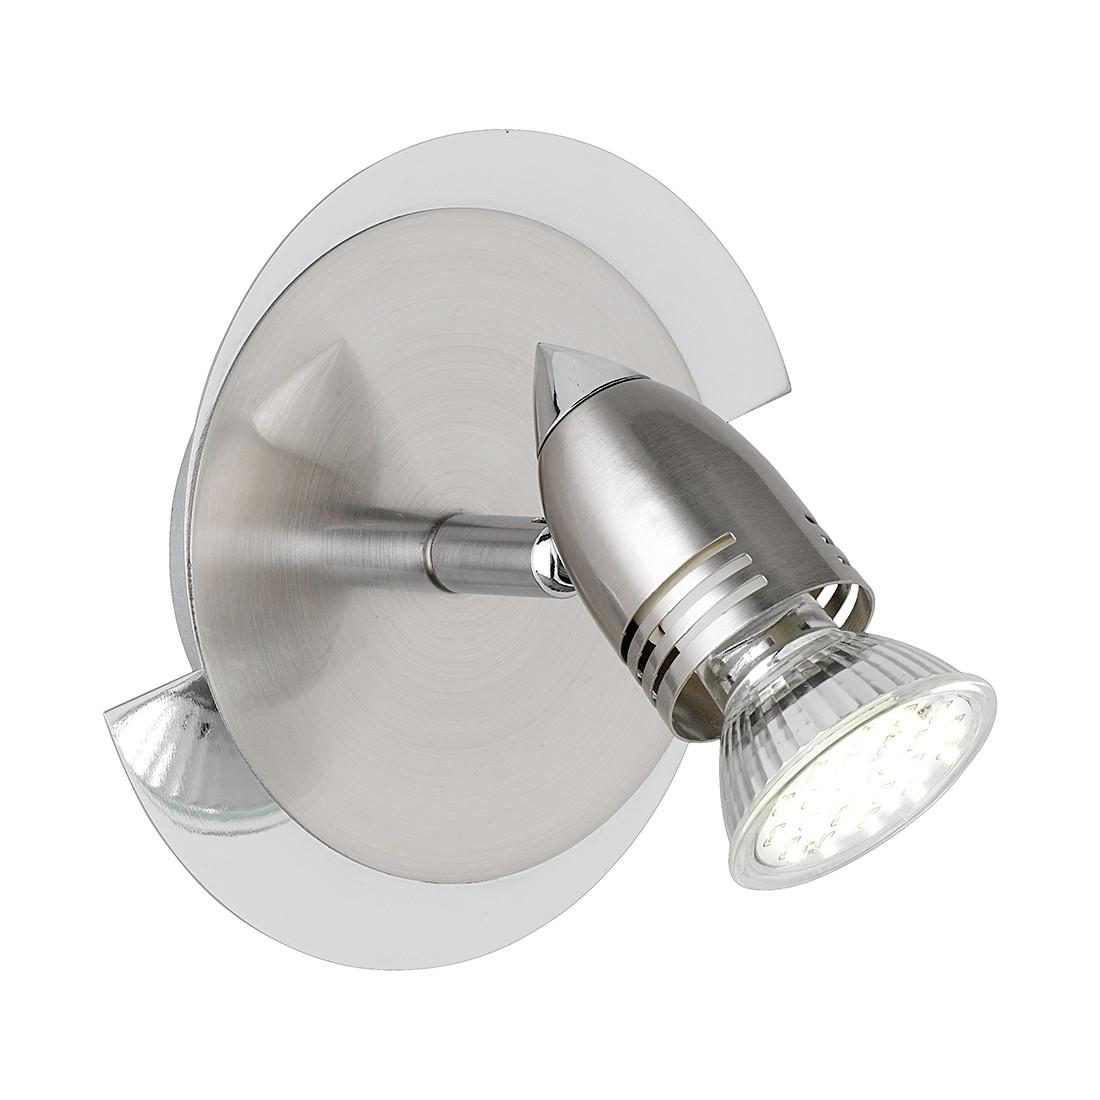 LED-Spot - 1-flammig, Trio